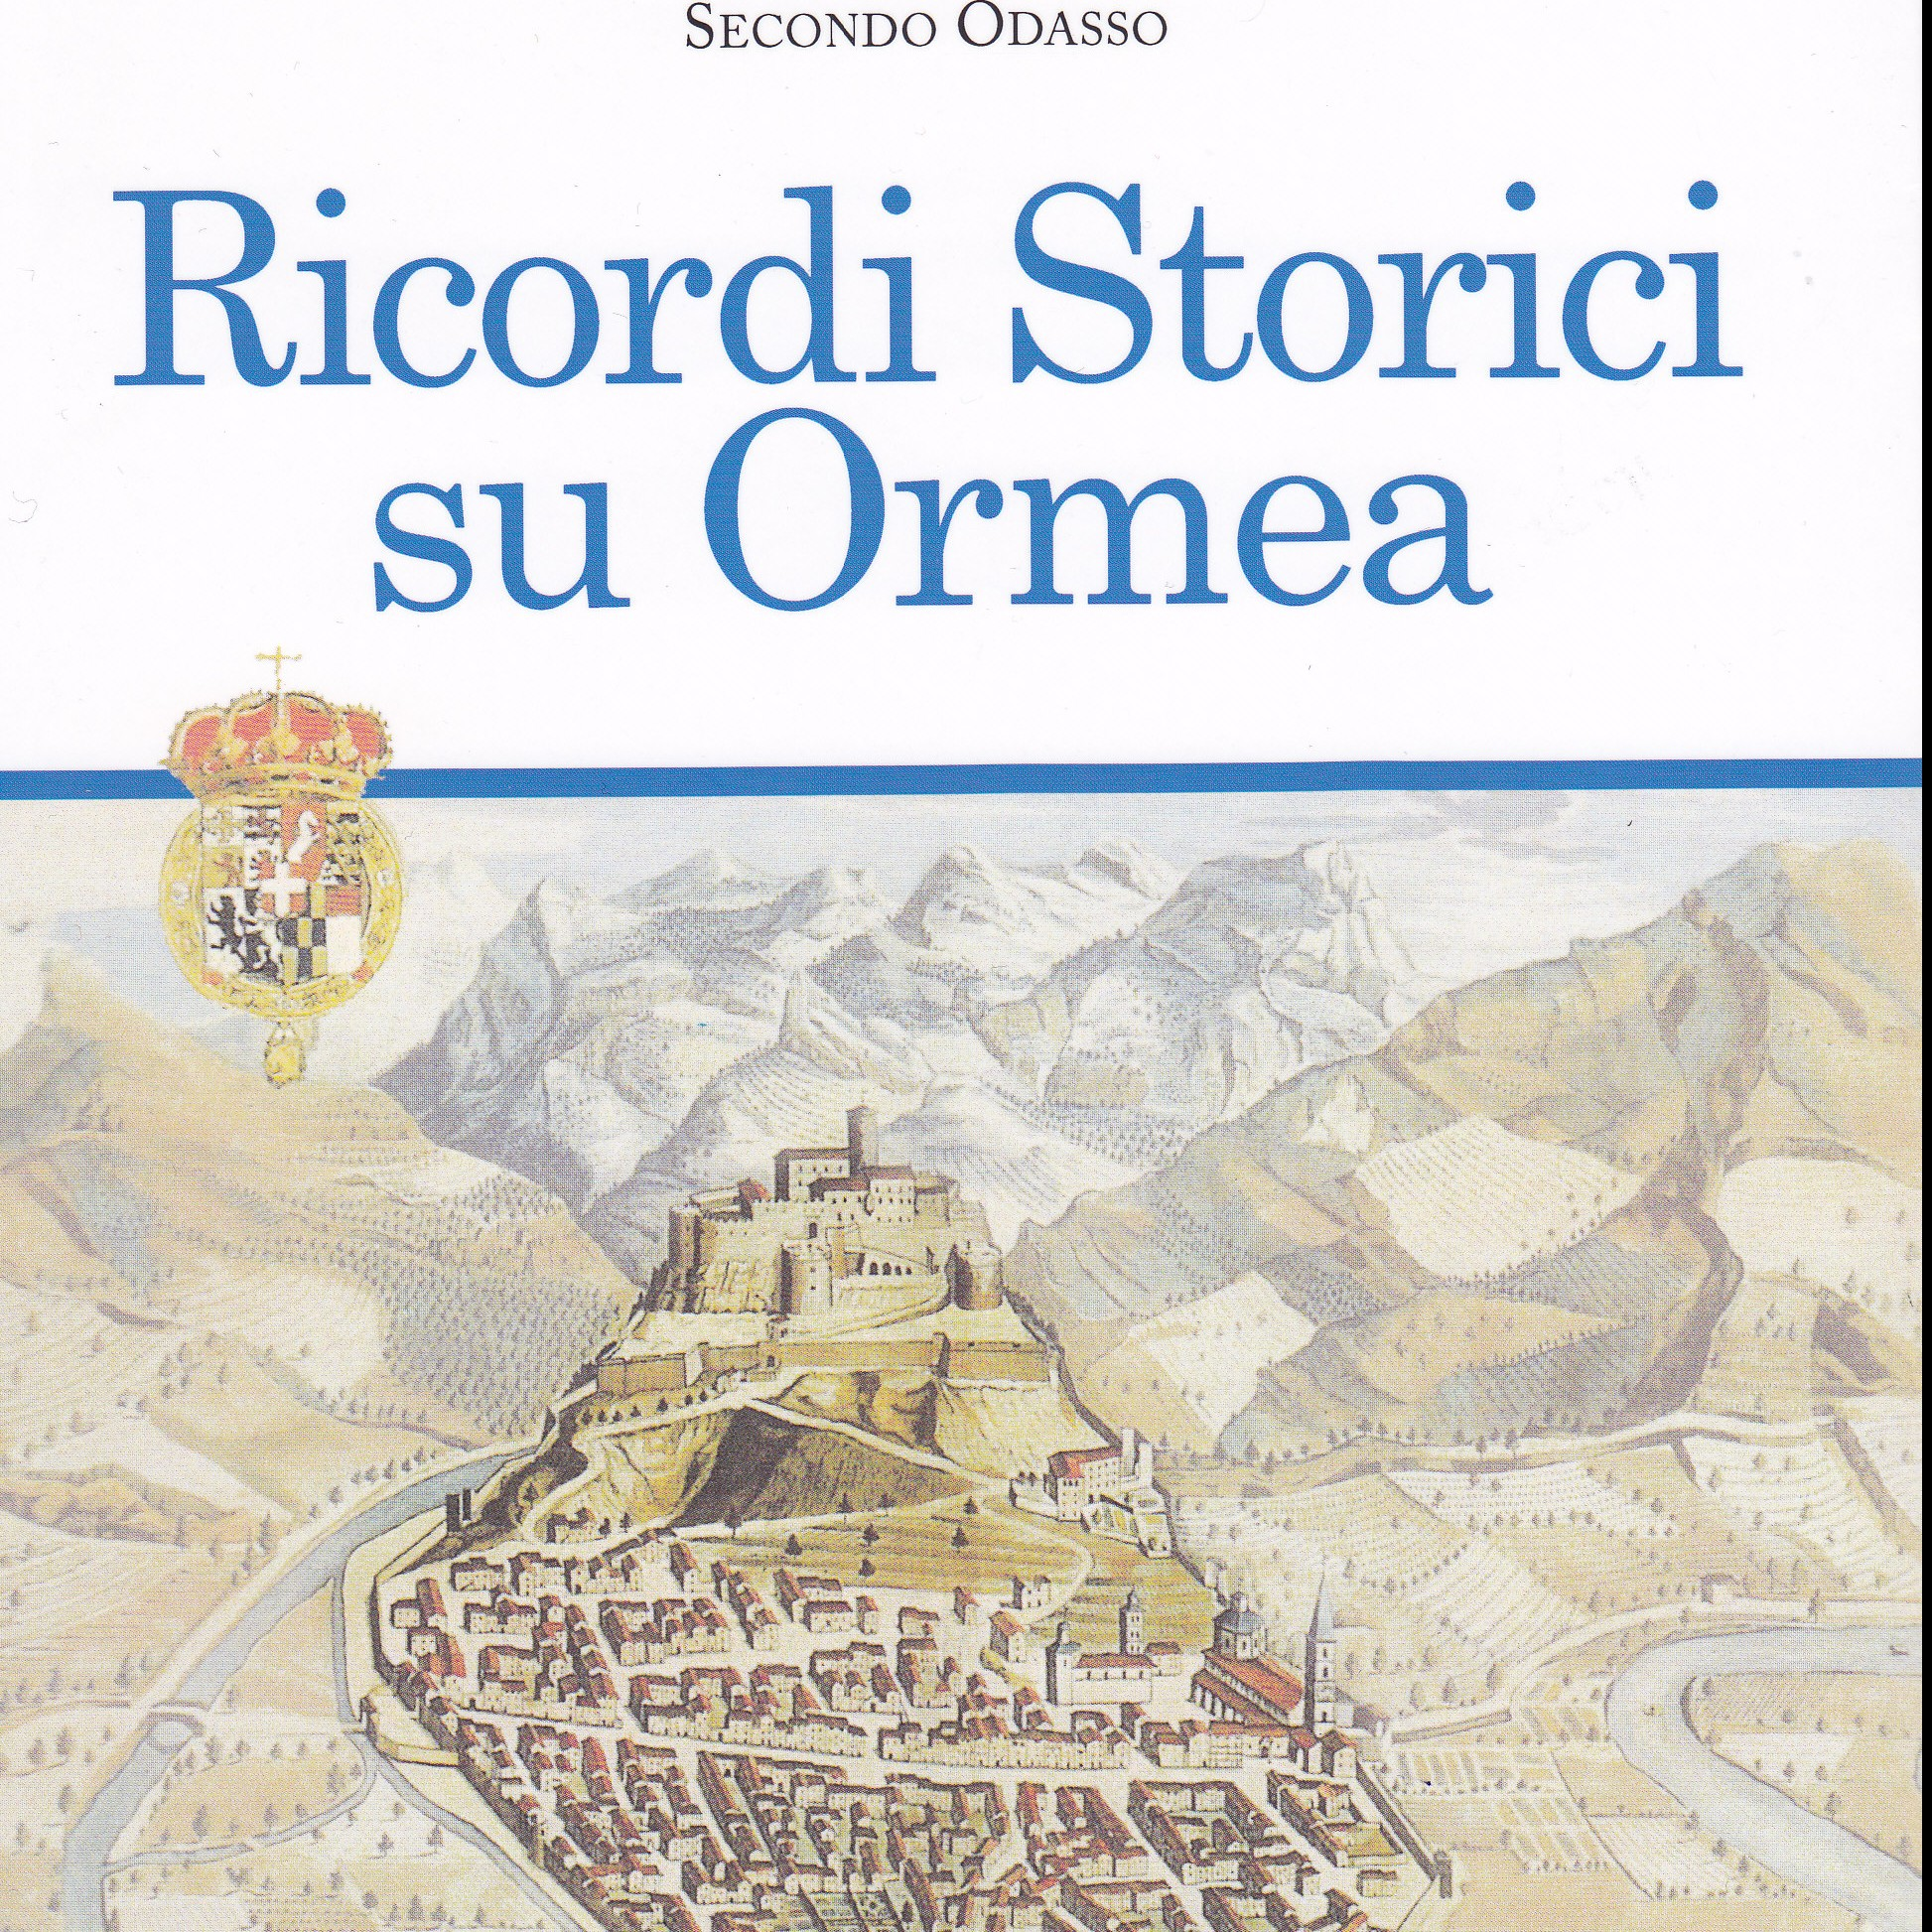 Ormea copertina libro don Odasso Ricordi Storici